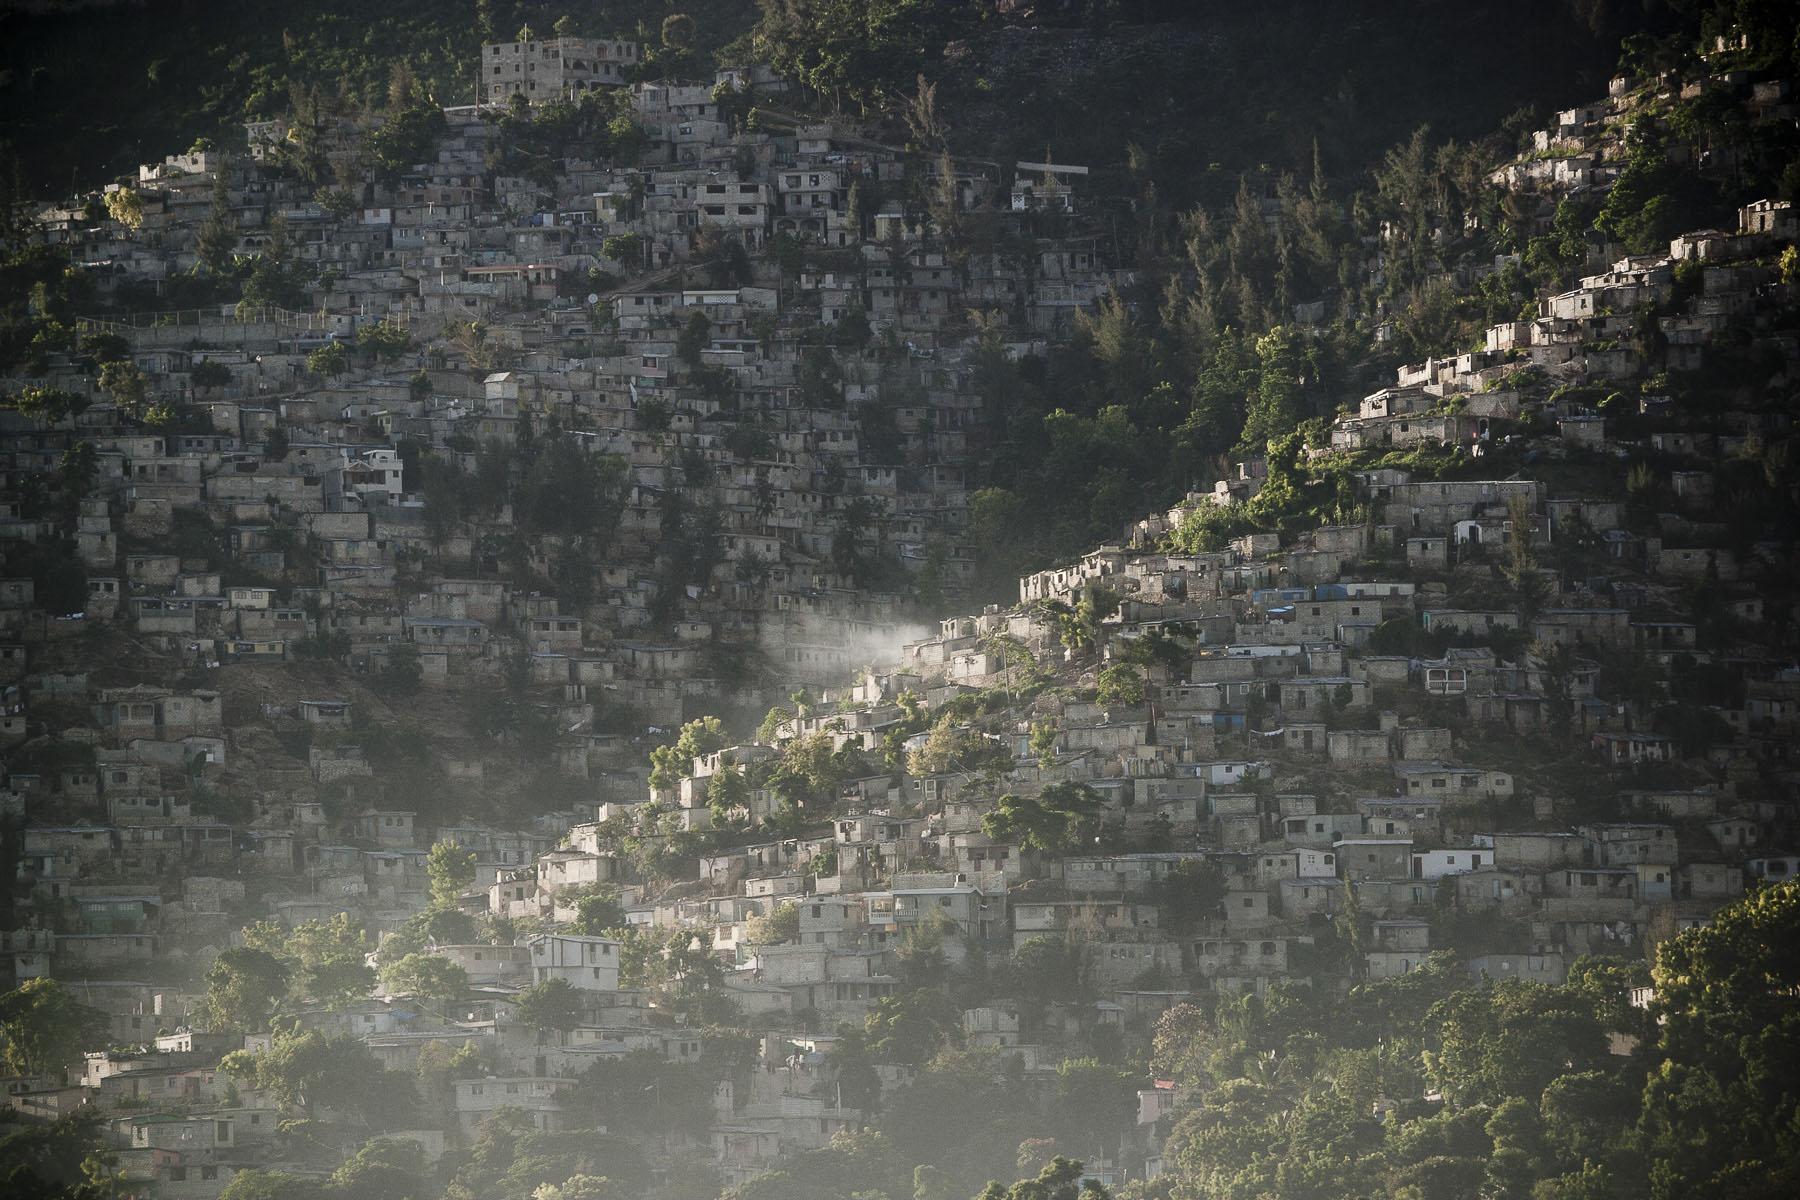 Morne-Calvaire. Dezermit and Jalouzi ravines (slums) in November 2003